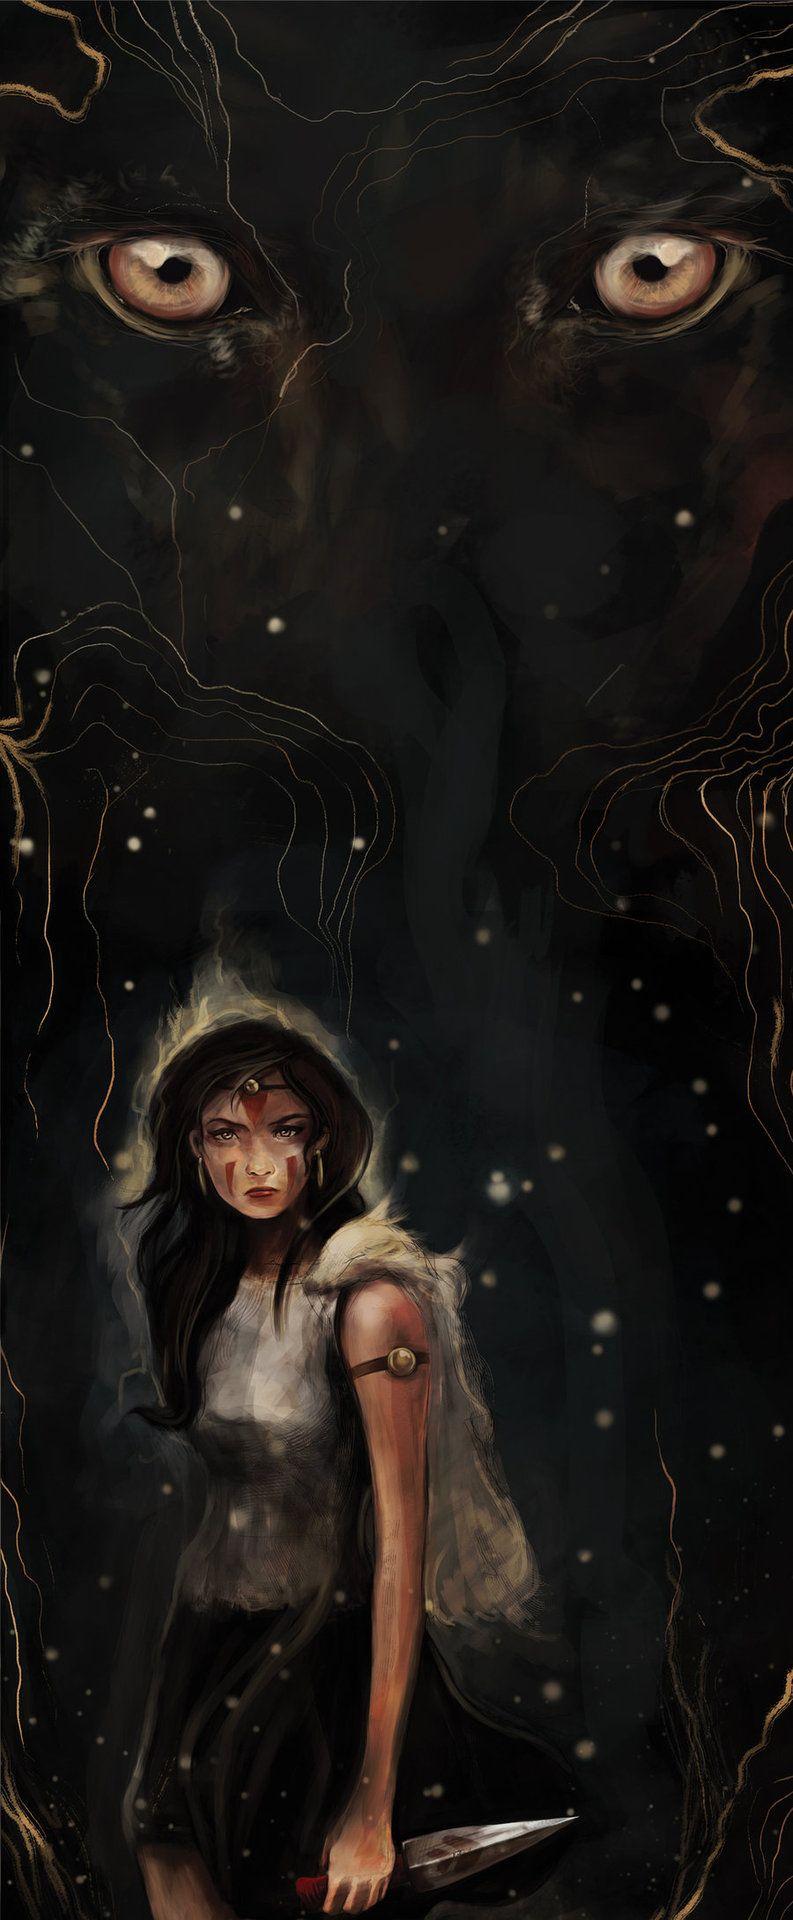 Princess Mononoke by Lee Court Studio ghibli, Princess